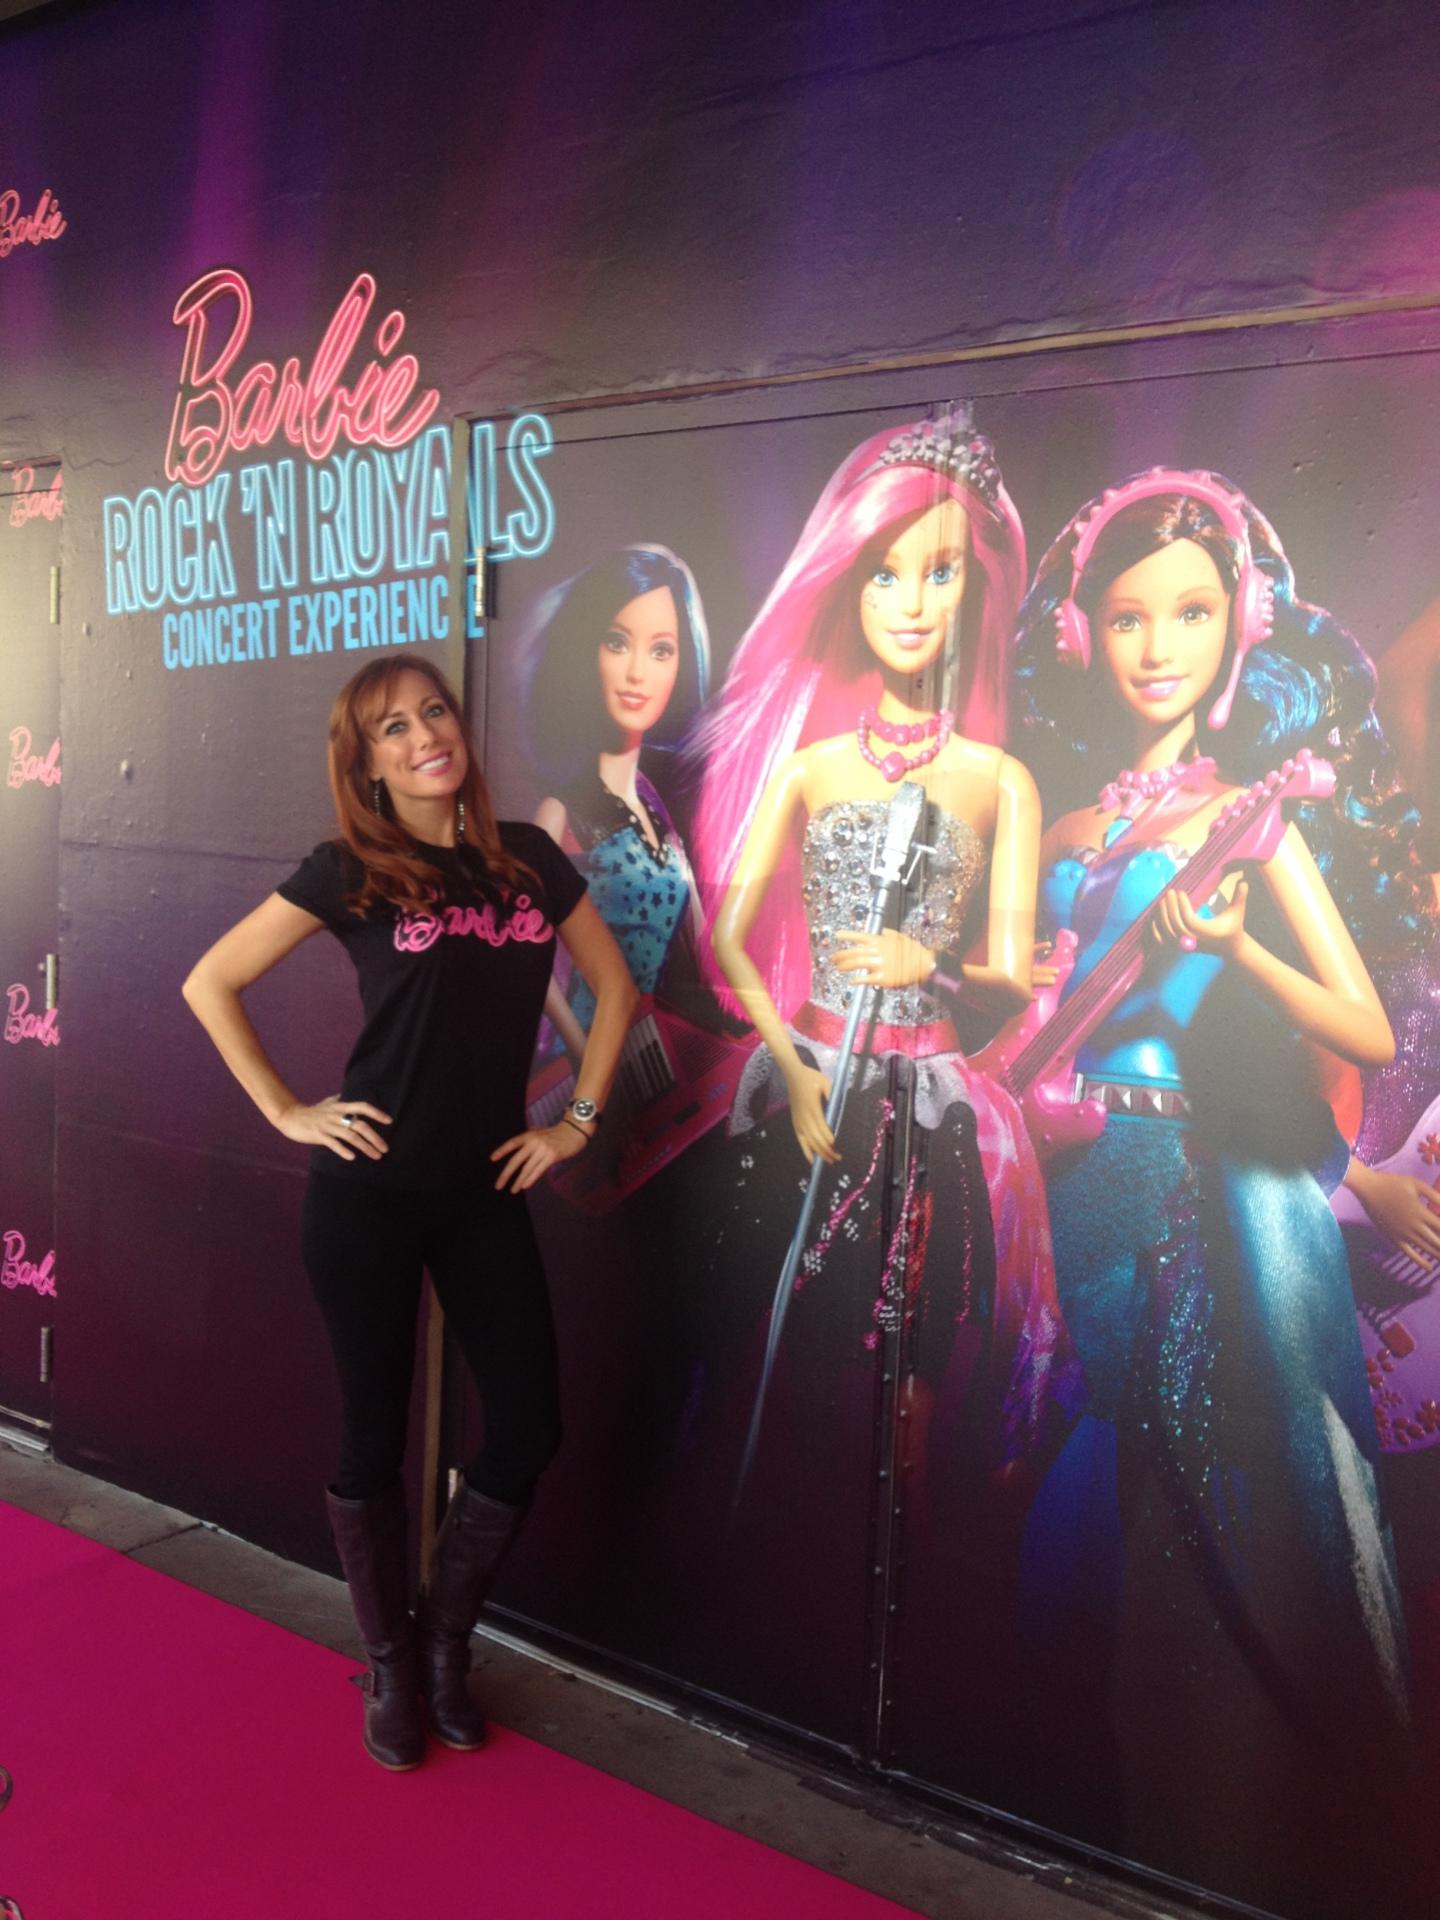 Barbie Rock & Royals Concert Pink Carpet Event